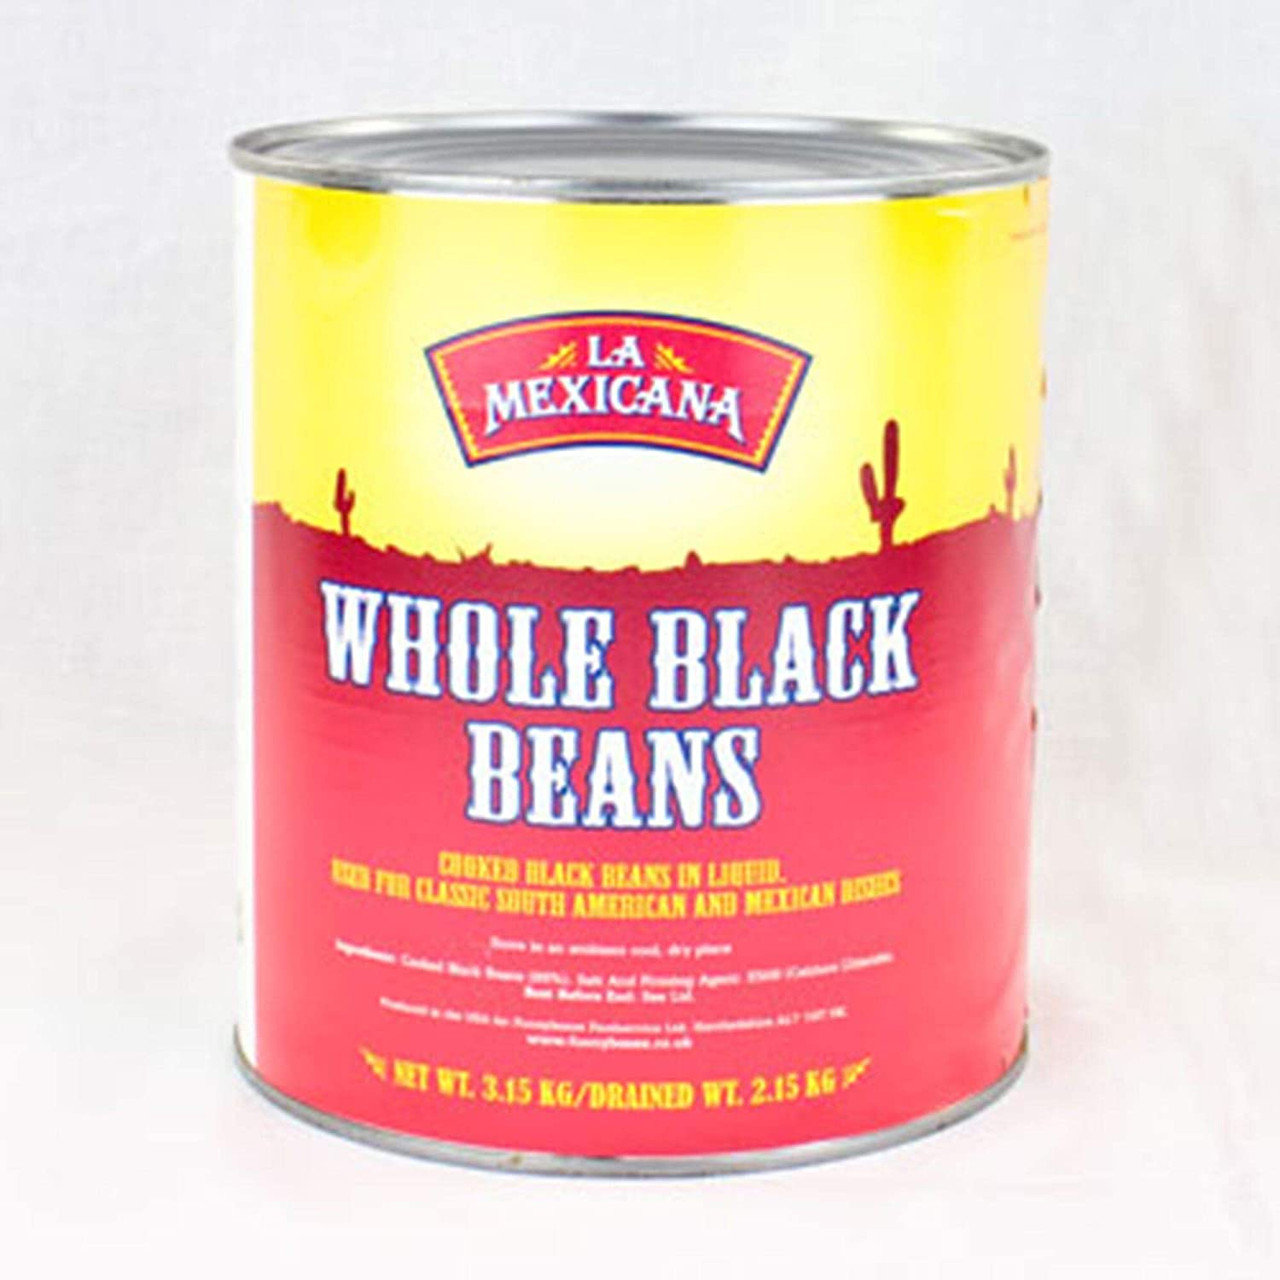 LA MEXICANA WHOLE BLACK BEANS IN BRINE 2.5kg